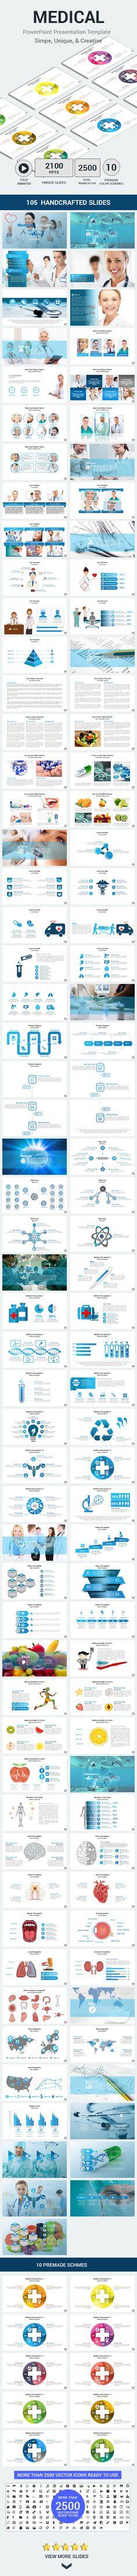 Medical PowerPoint Presentation Template #design #slides Download: http://graphicriver.net/item/medical-powerpoint-presentation-template/14387130?ref=ksioks